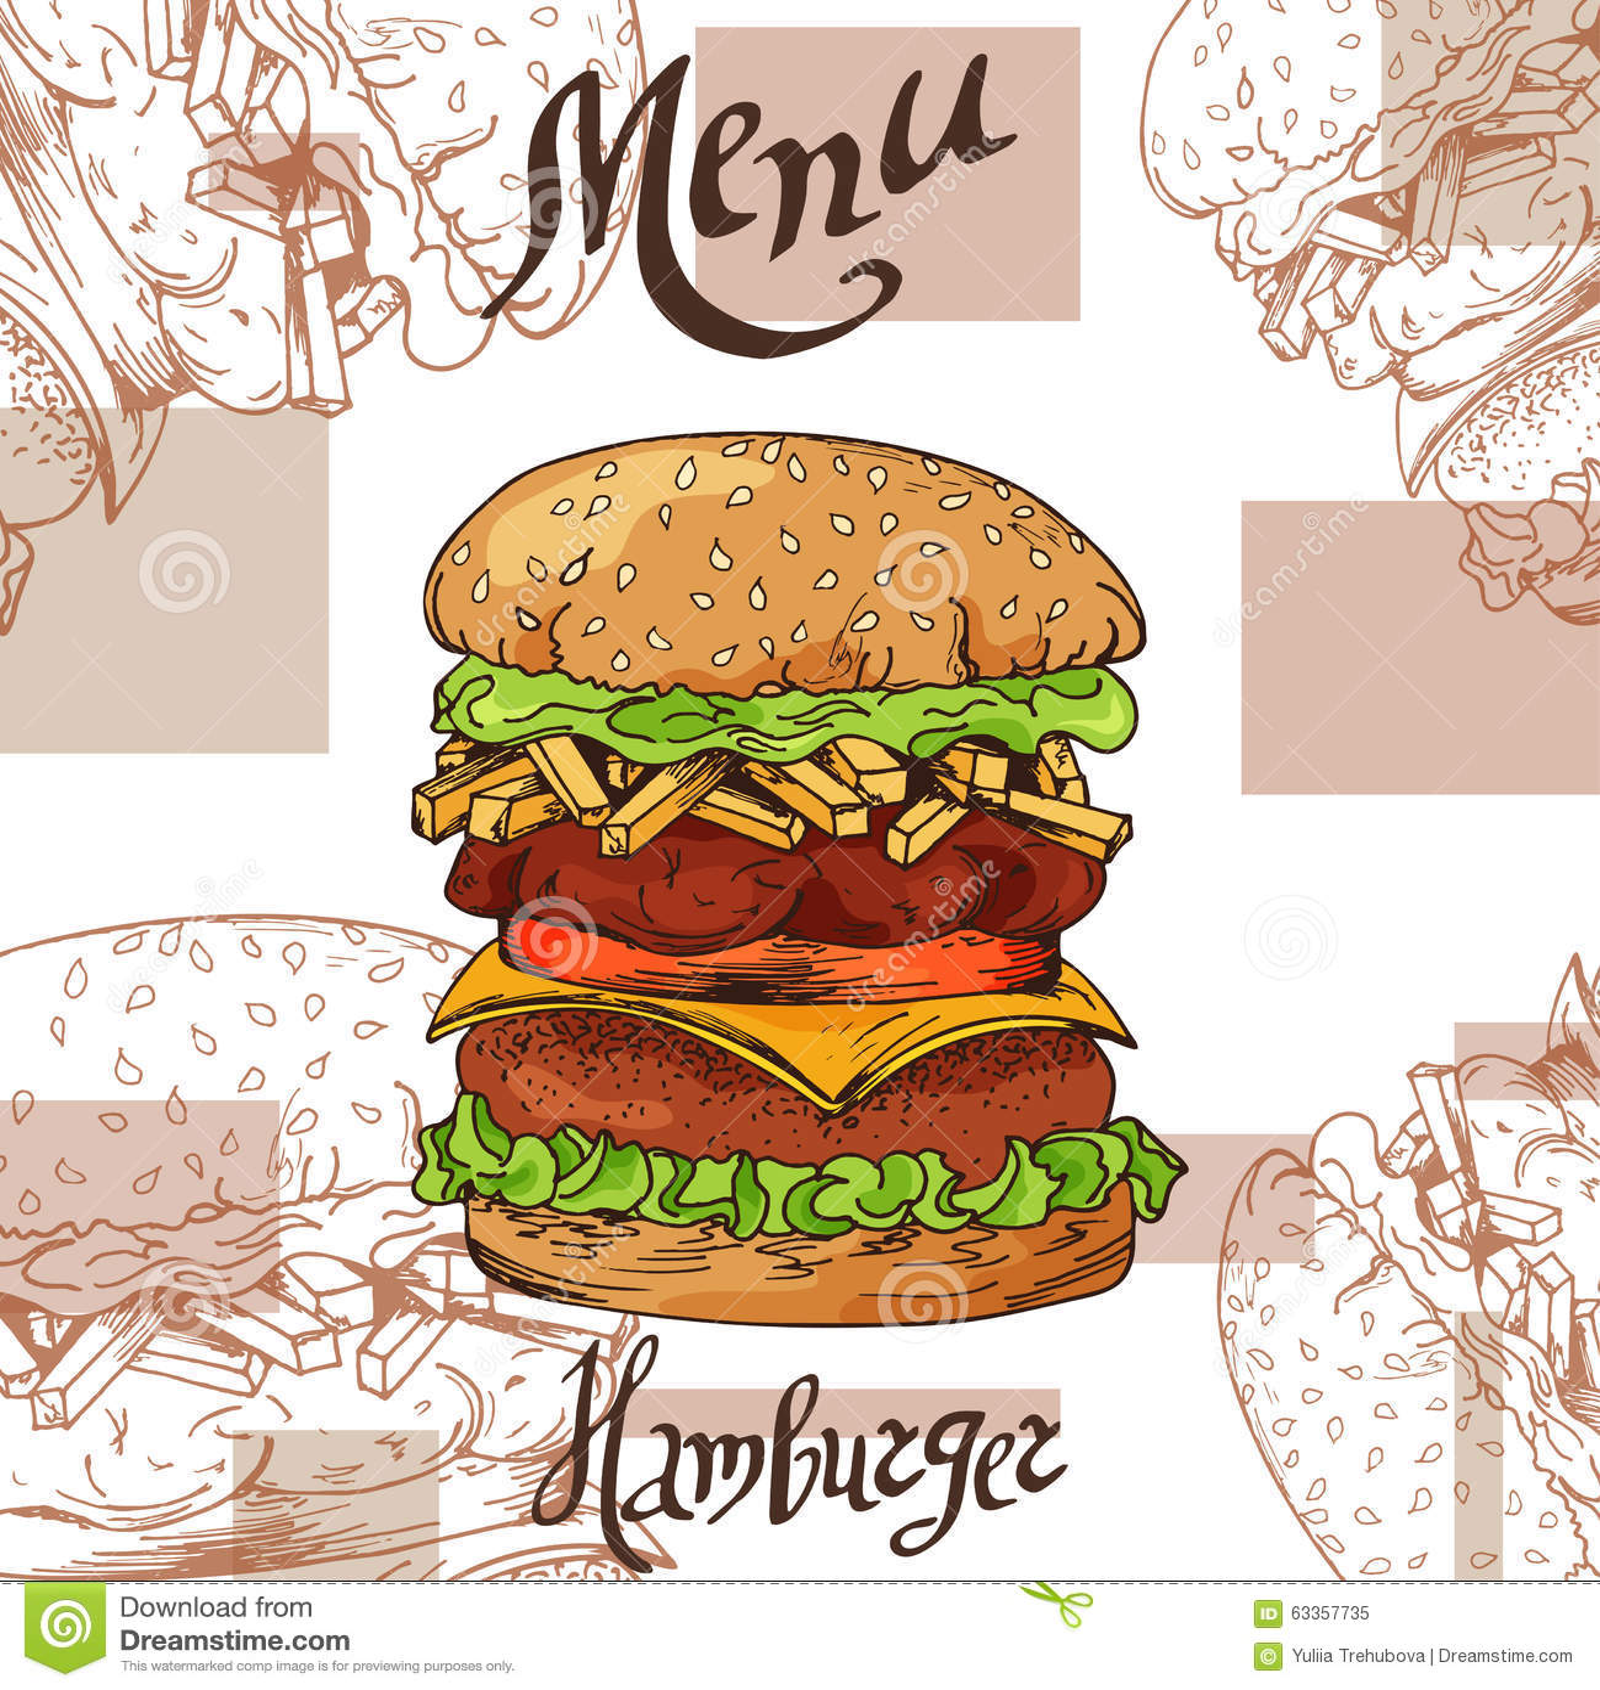 fast food poster with hamburger hand draw retro illustration vintage burger design template. Black Bedroom Furniture Sets. Home Design Ideas